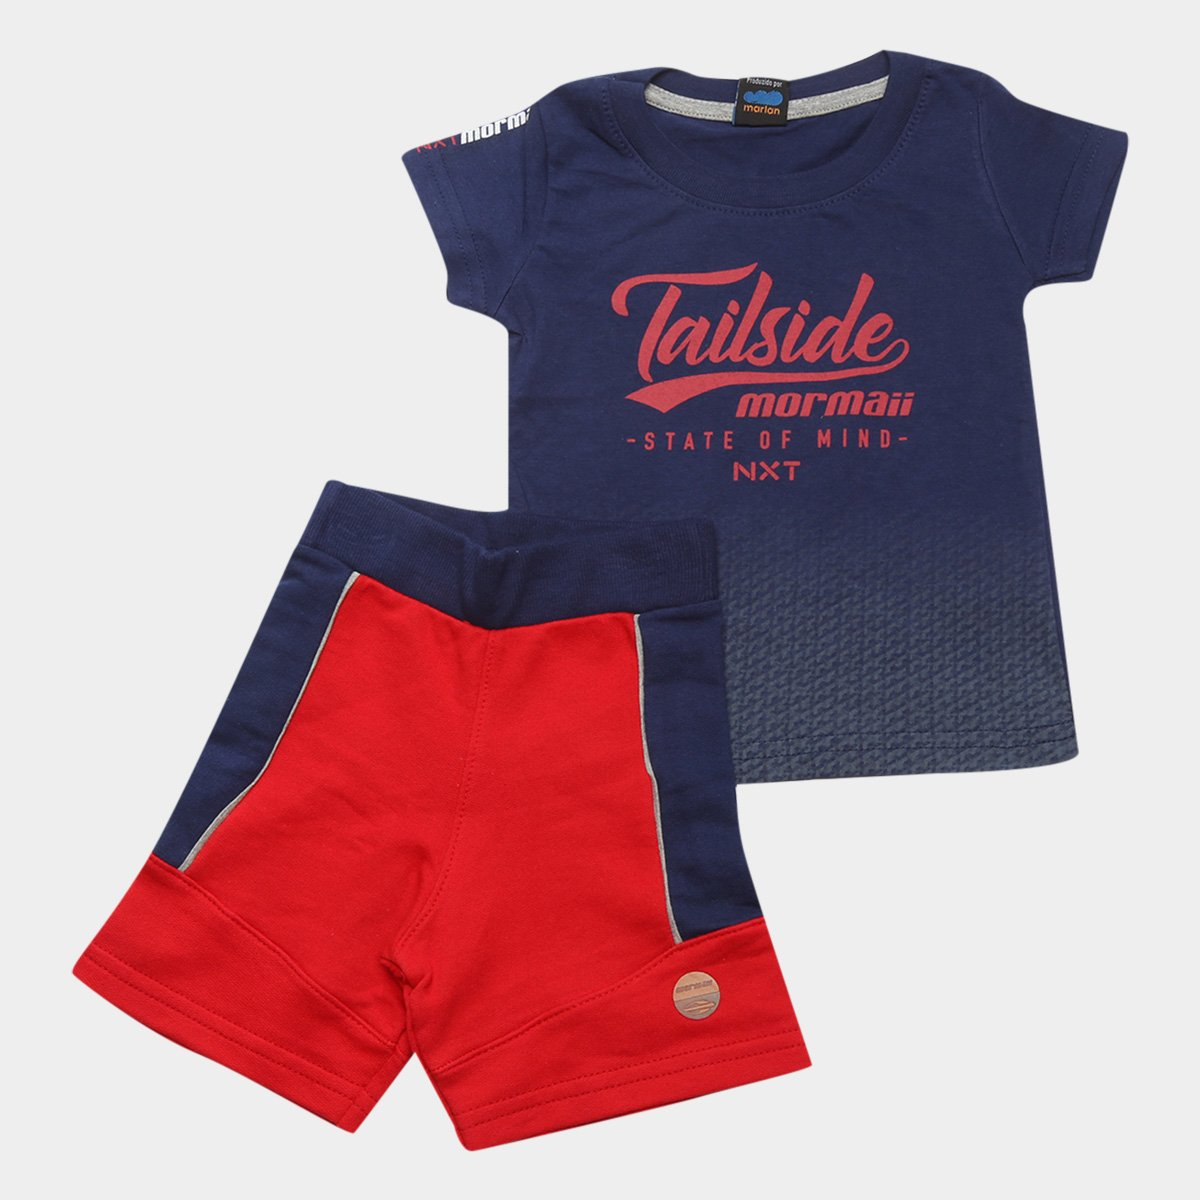 Conjunto Infantil Mormaii NXT Tailside Camiseta + Bermuda Masculino